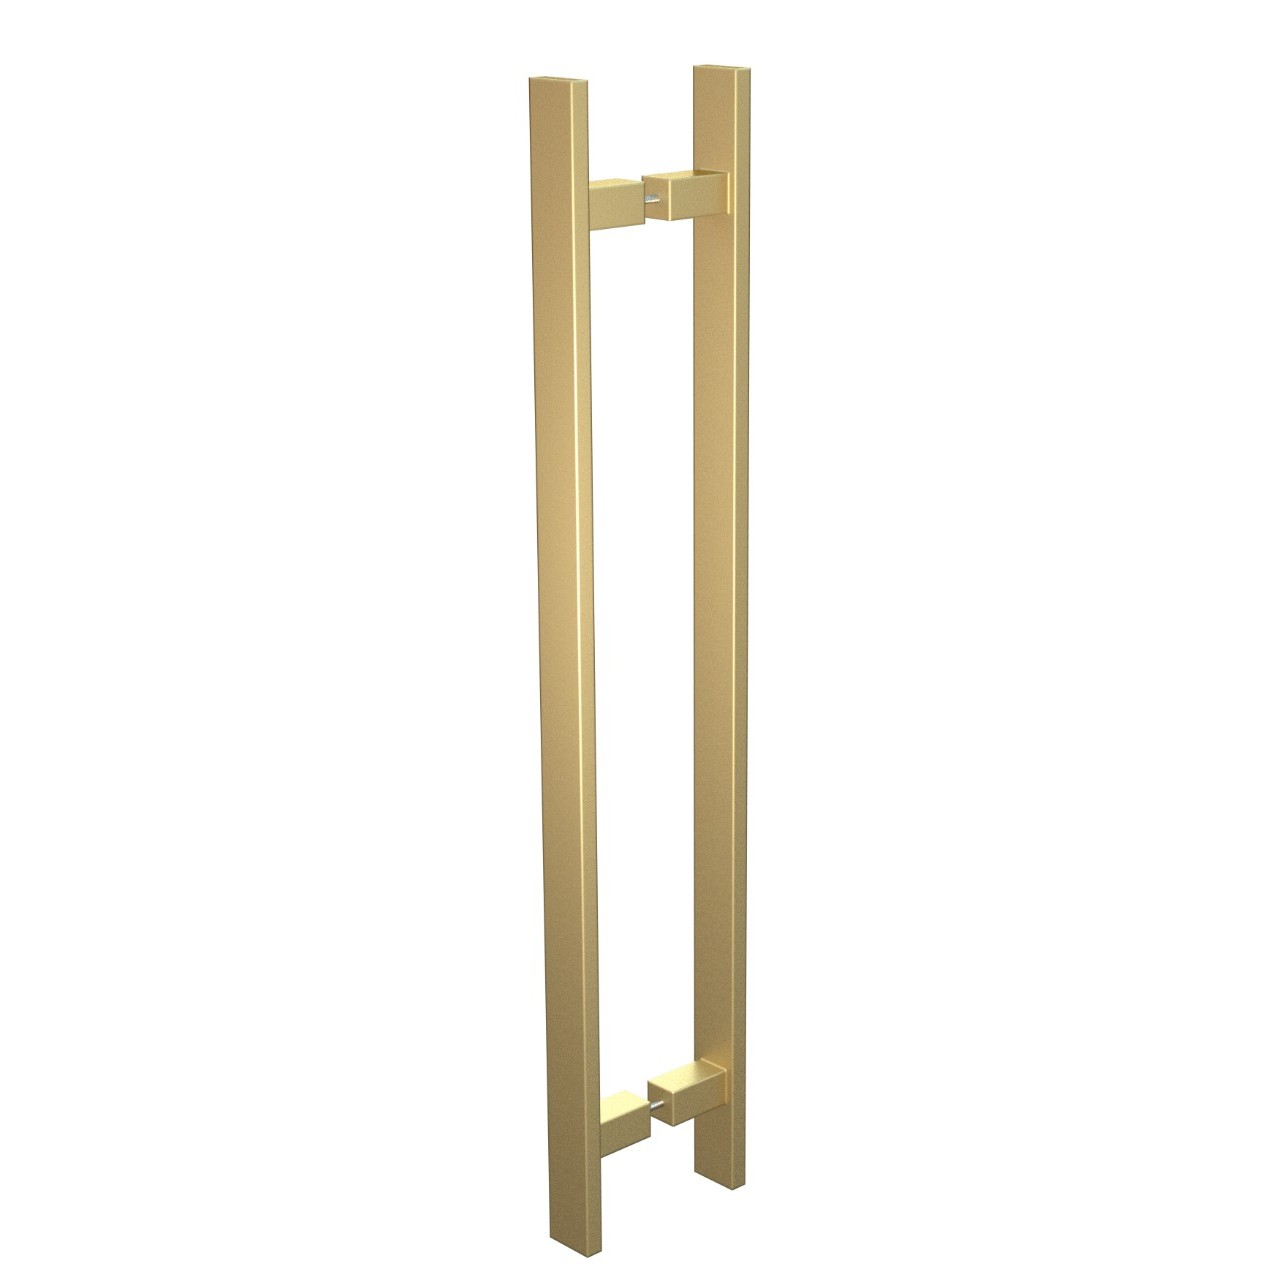 Puxador de Portas Sobrepor Aco Inox 60cm 1 par Trio Gold - Acobrasil